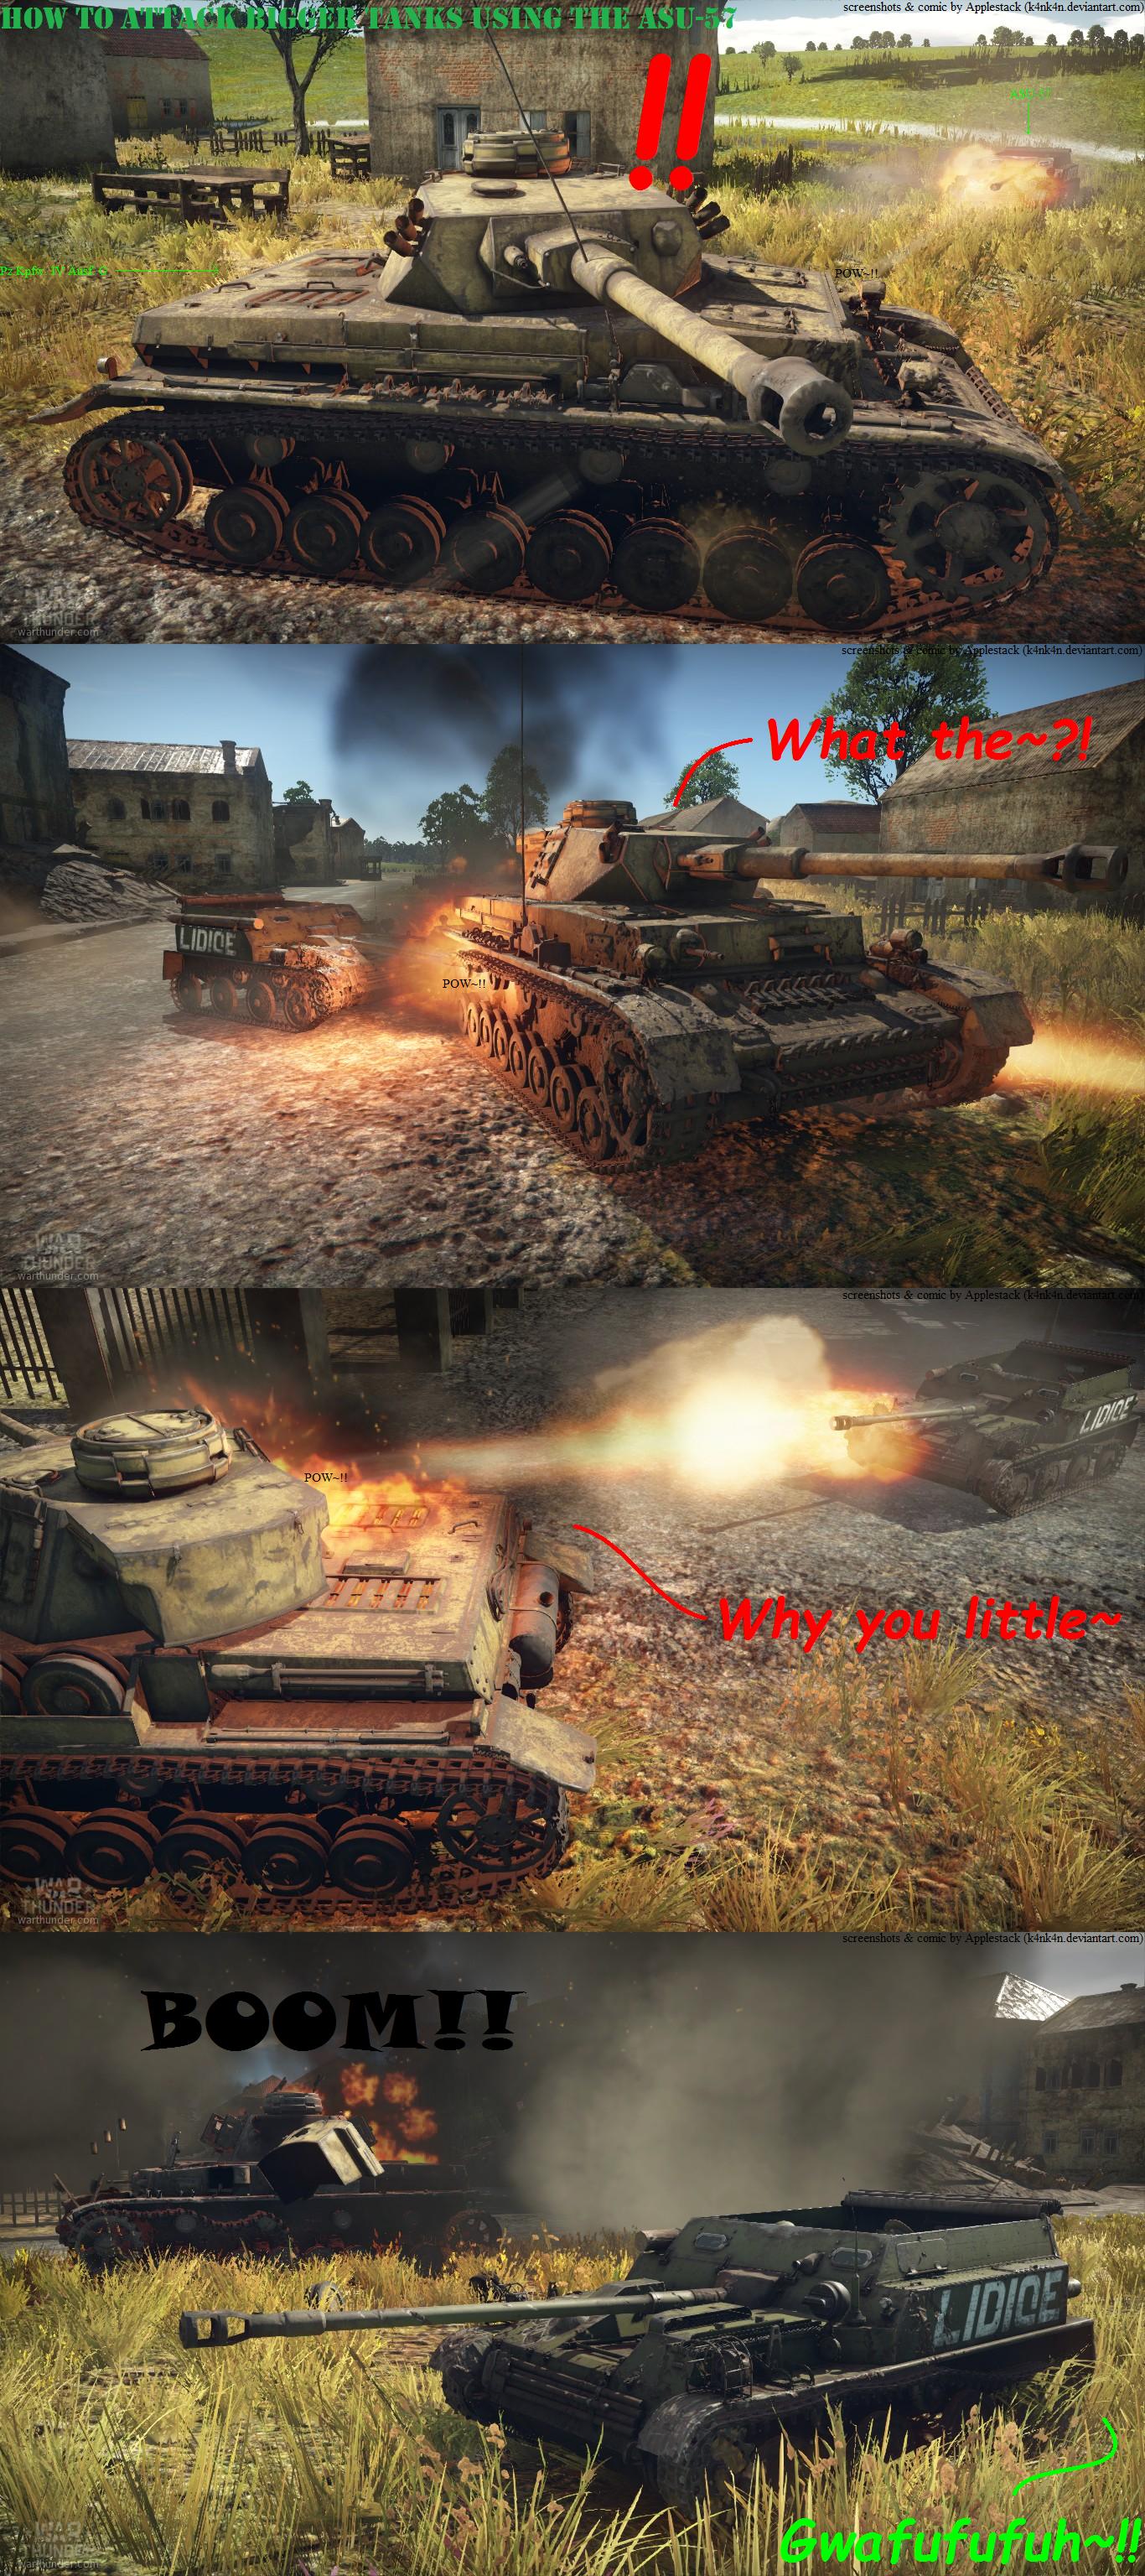 war_thunder_comic_20160803_by_k4nk4n-dac